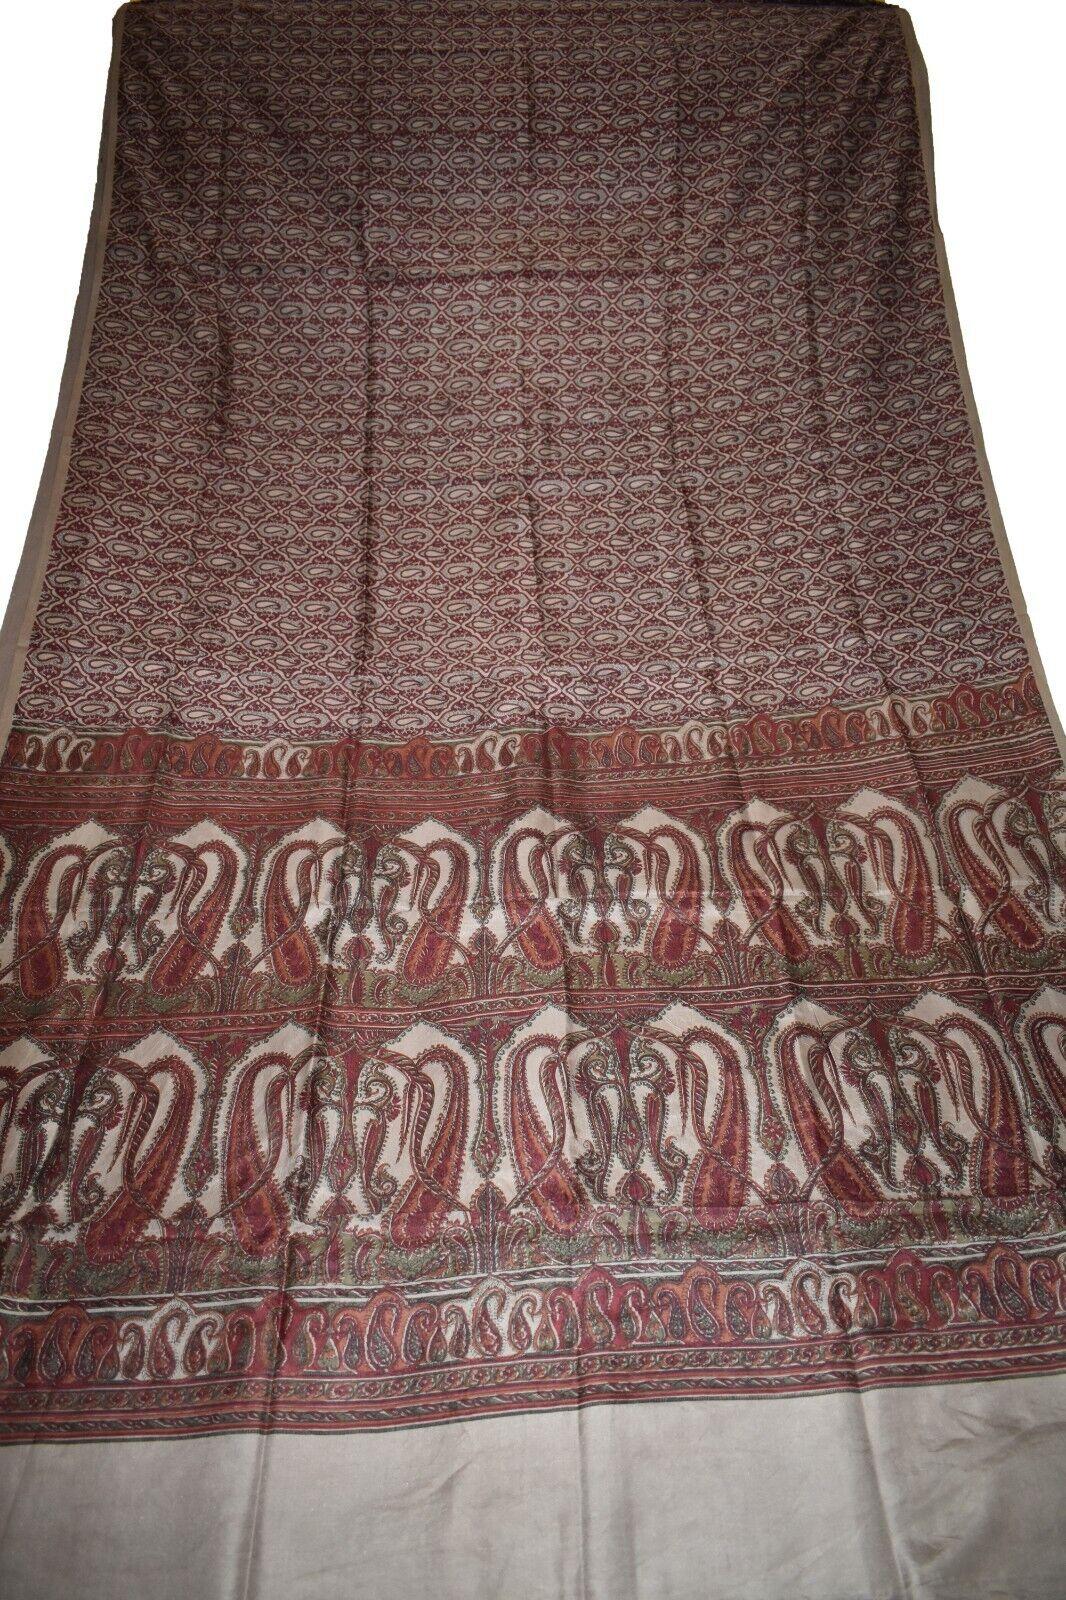 Vintage Printed Saree Brown100% Pure Silk Floral Print Sari Design Craft PR4001